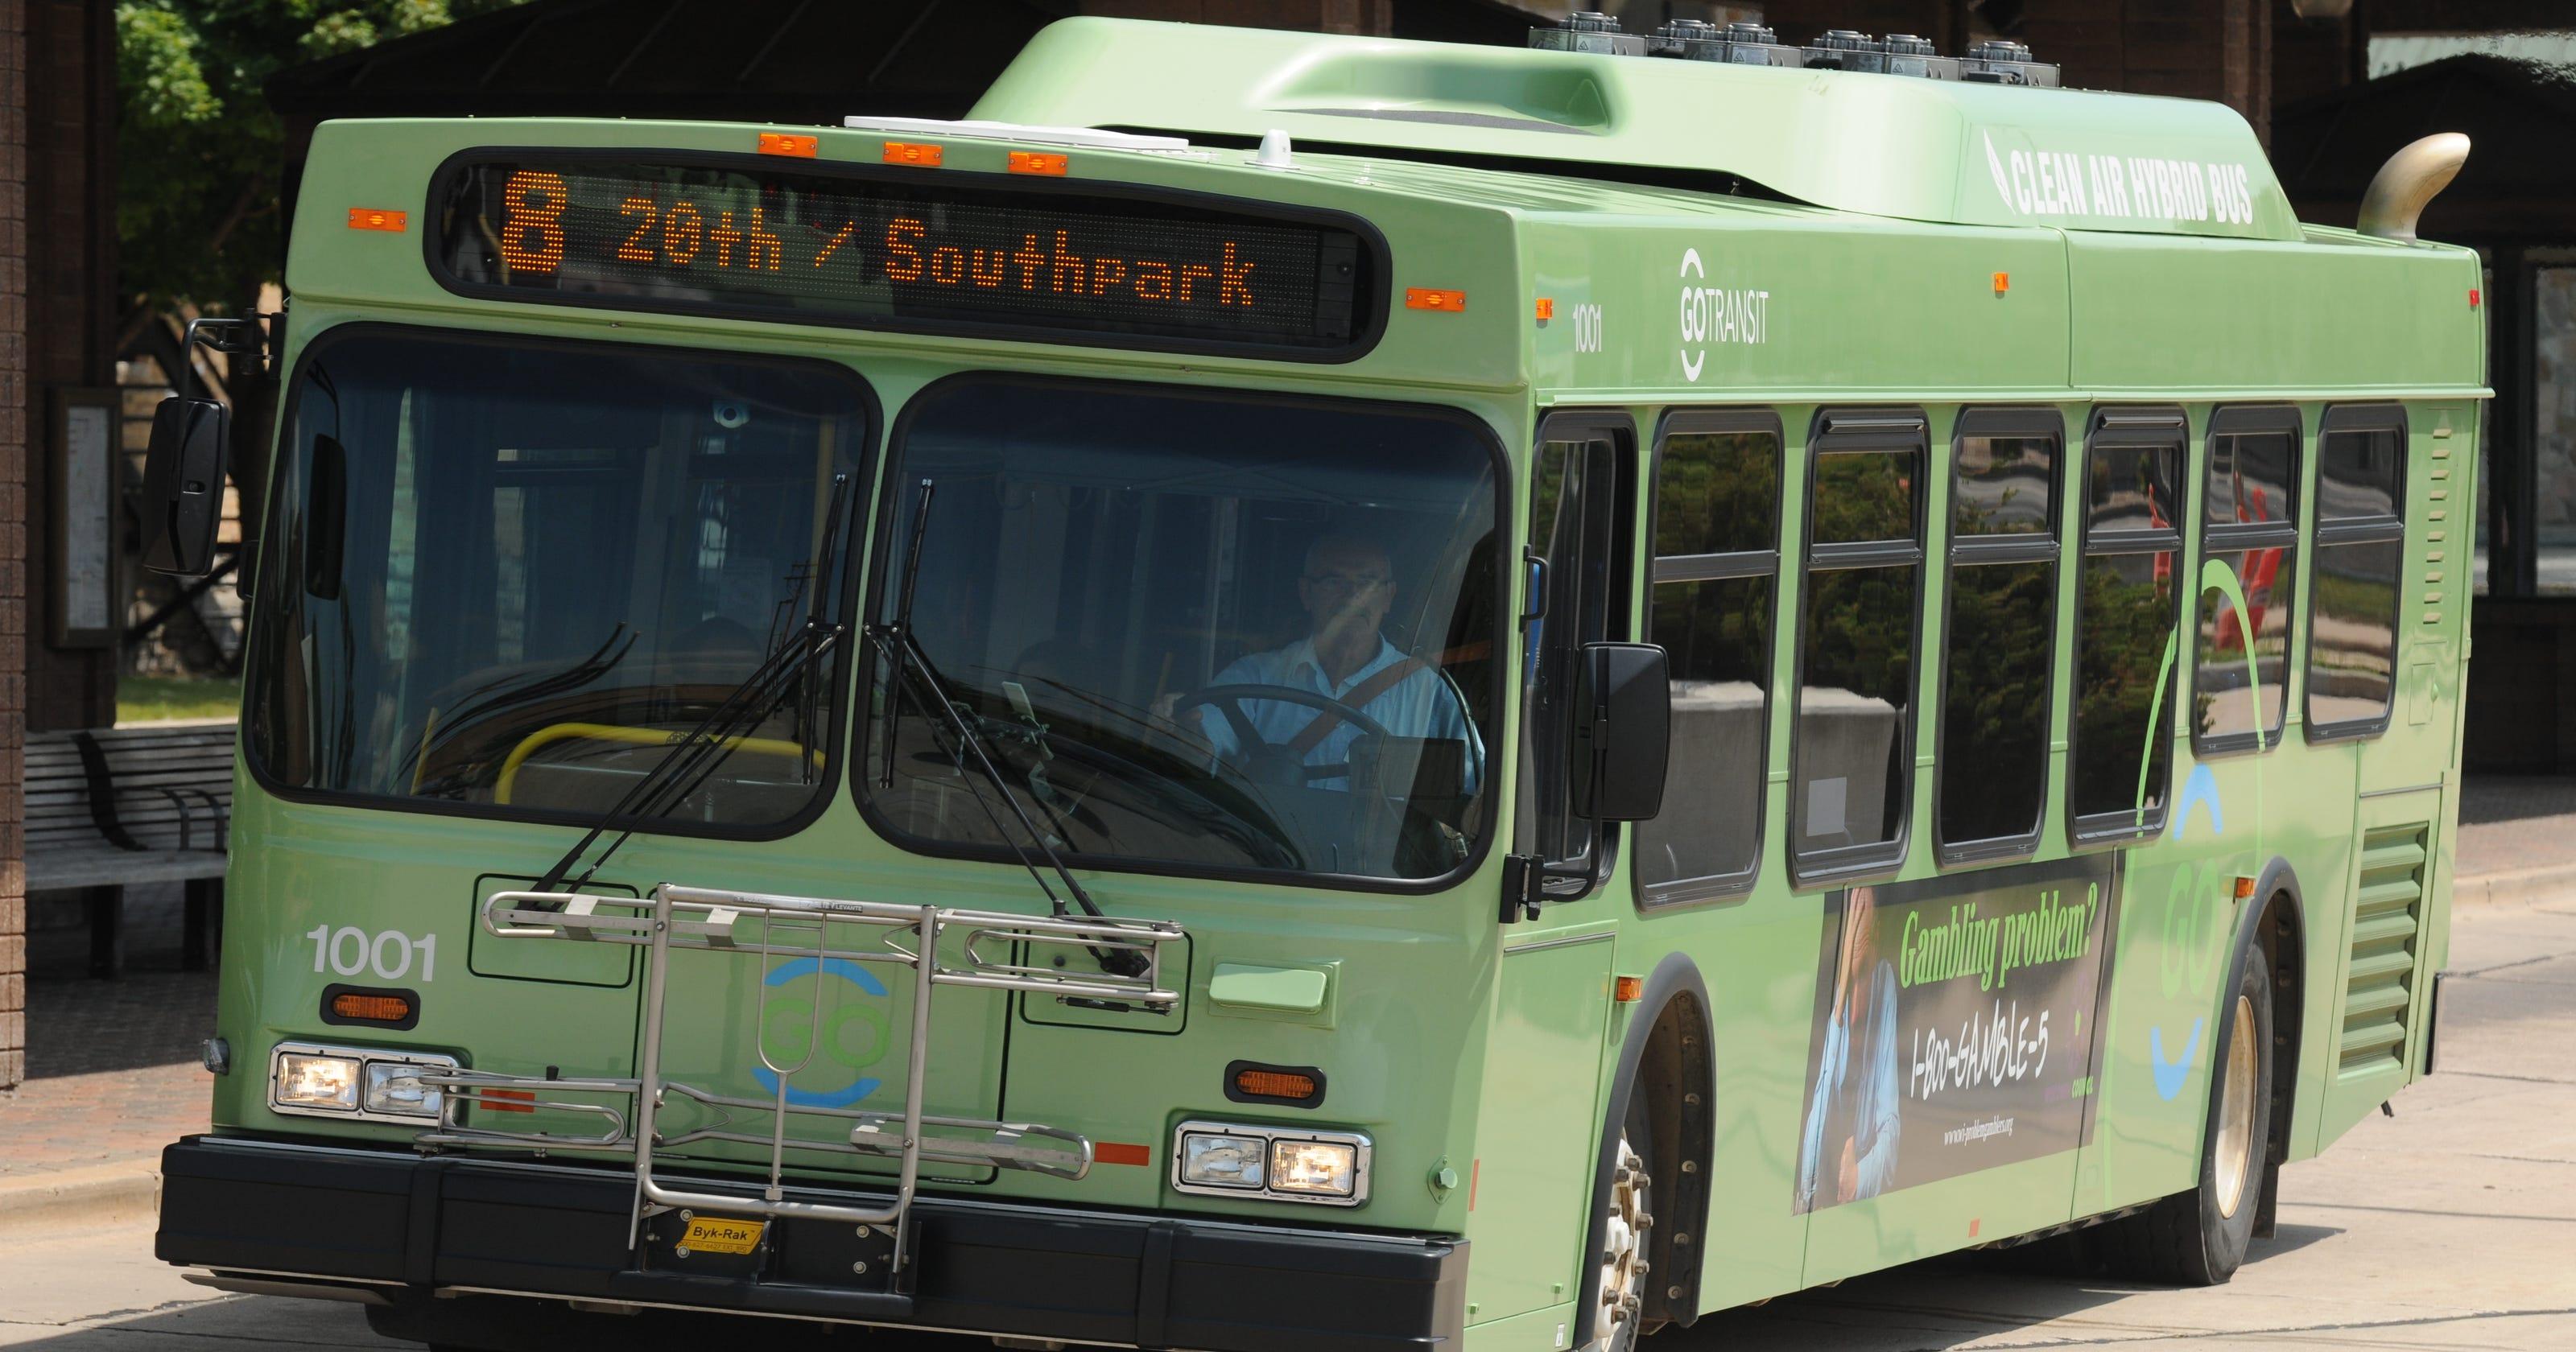 Oshkosh considers city bus fare increase, Route 9 transit revamp